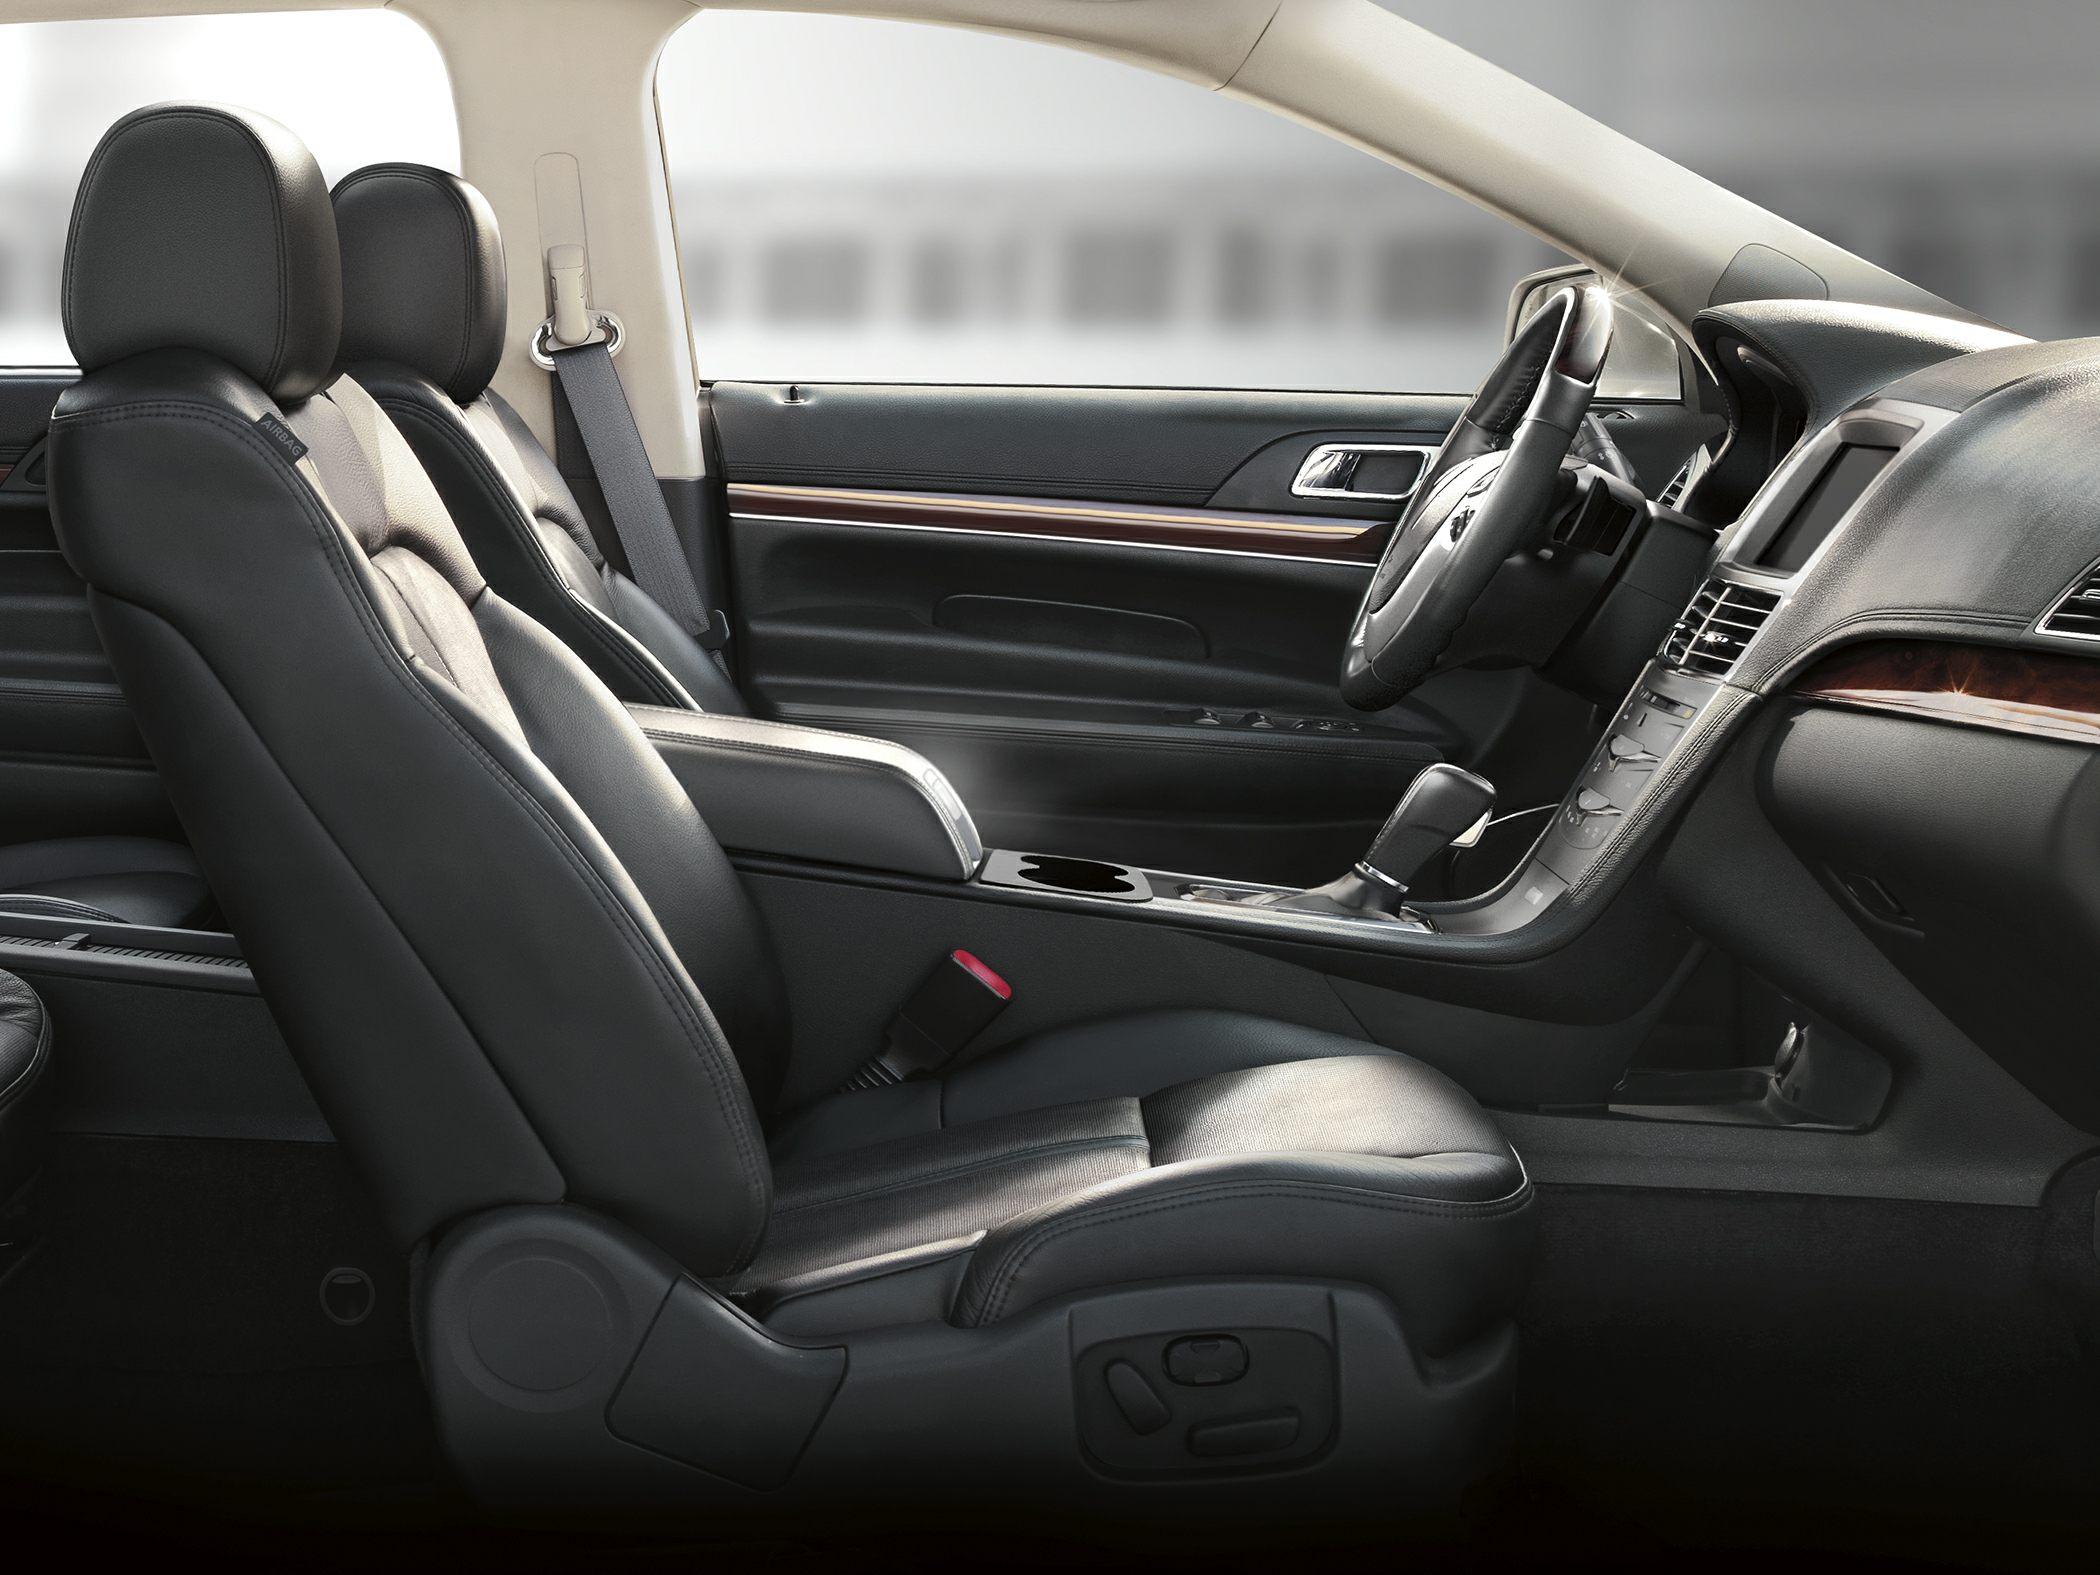 2019 Lincoln Mkt For Sale